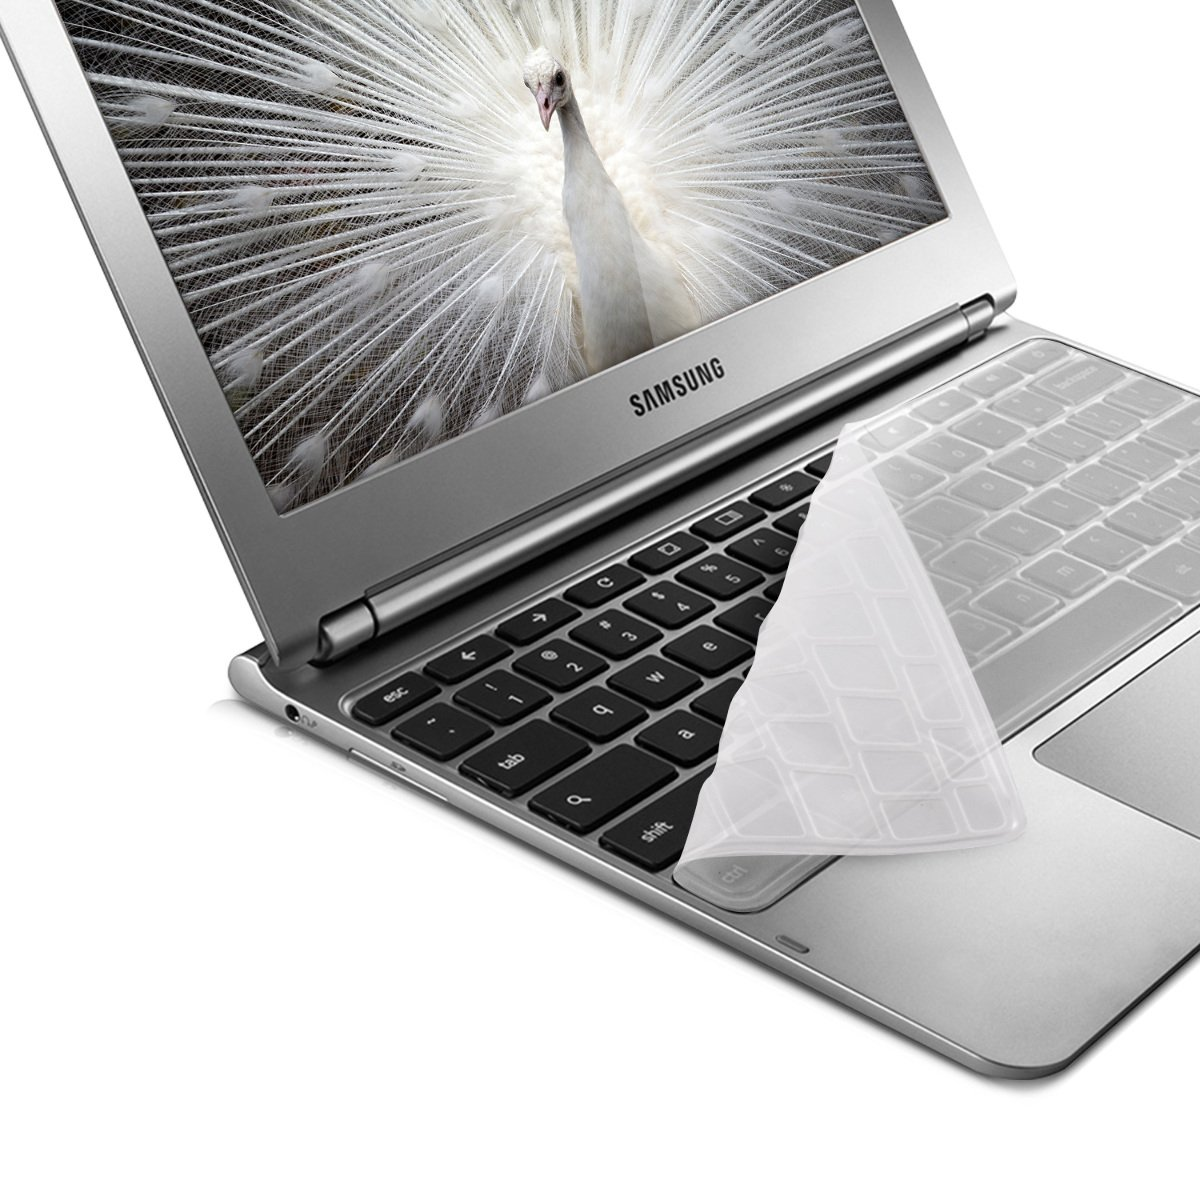 kwmobile Robuster hauchd/ünner Tastaturschutz QWERTY aus Silikon f/ür Samsung ARM 11.6 Chromebook Series 3 US